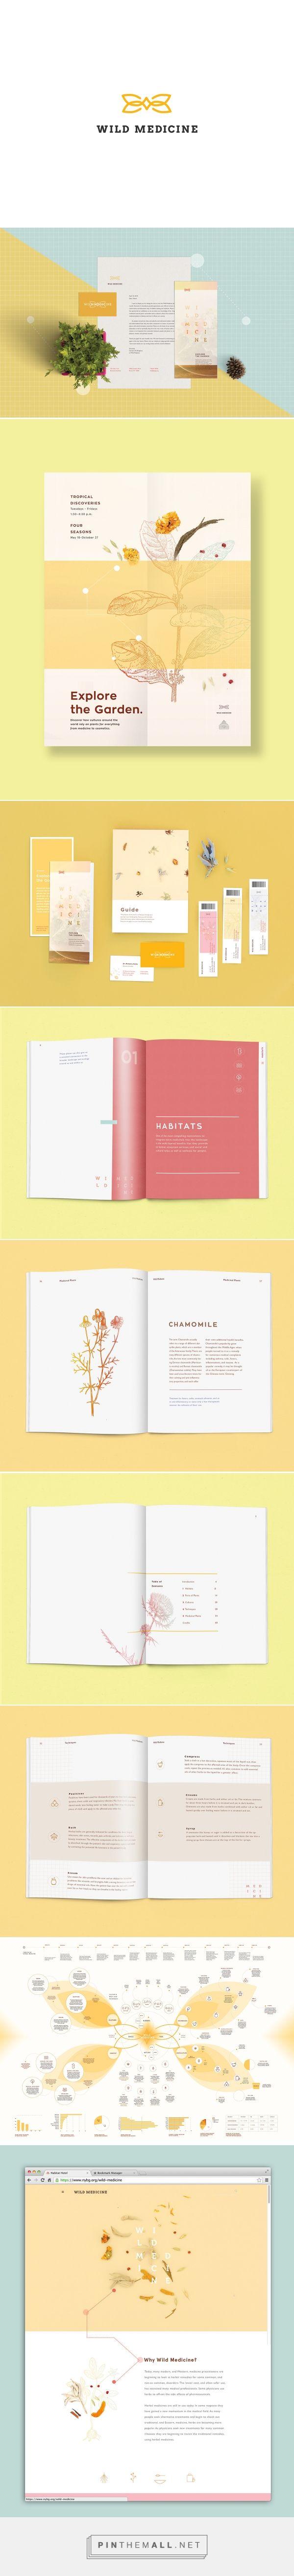 Wild Medicine Branding by Grace Kuk on Behance